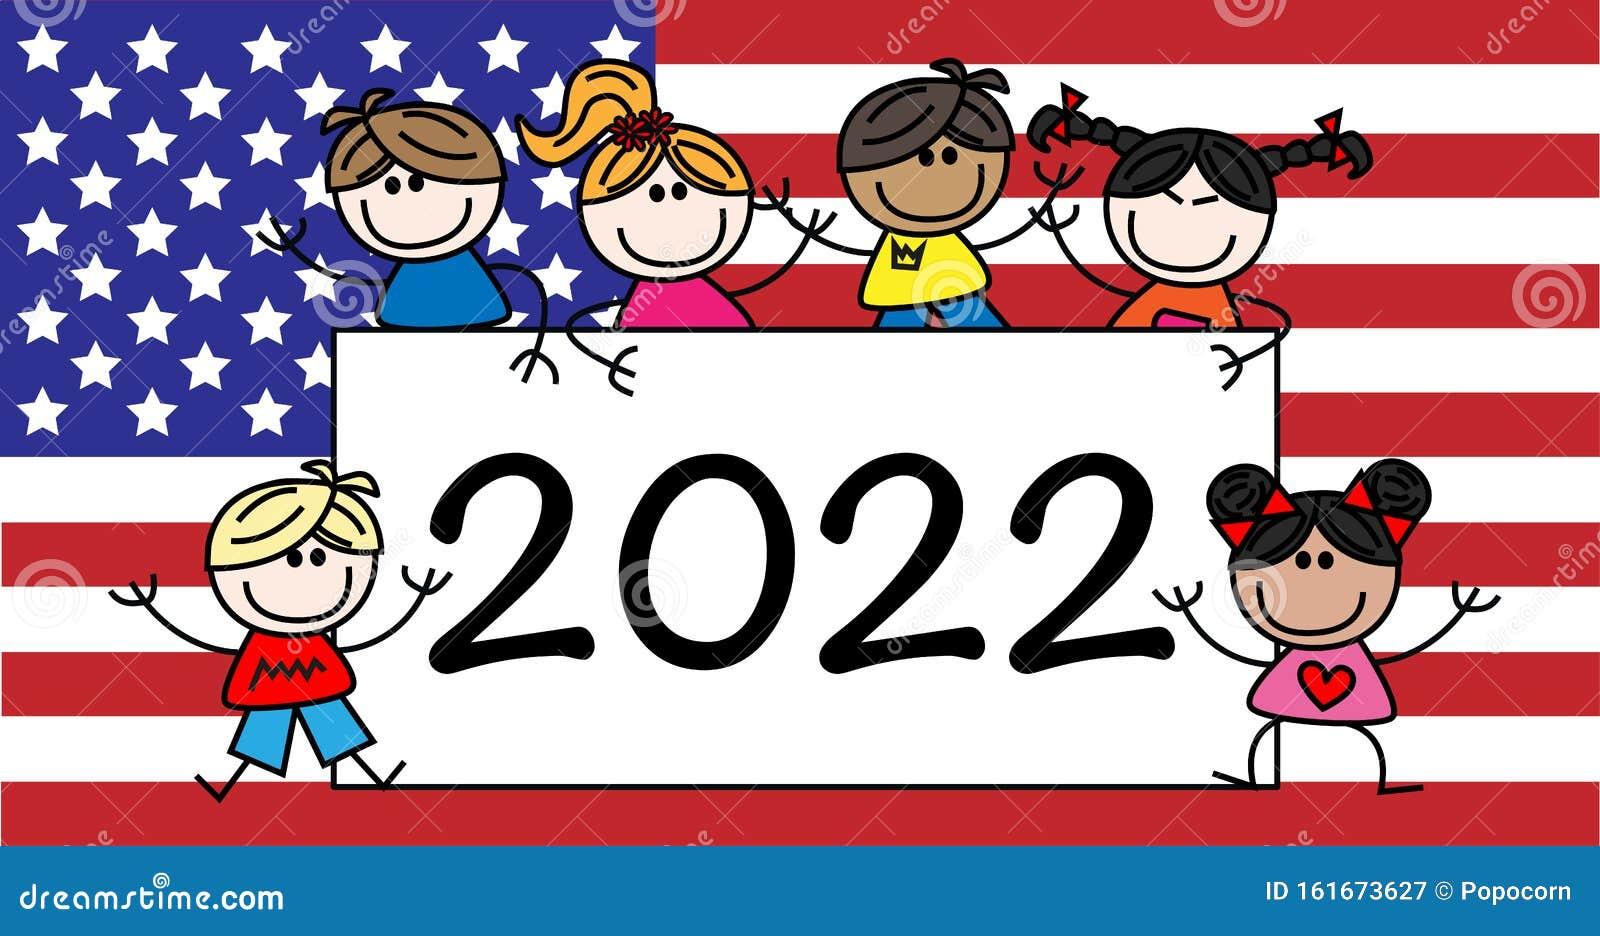 Kids Calendar 2022.New Year 2022 Calendar Mixed Ethnic Kids Stock Vector Illustration Of Banners Event 161673627